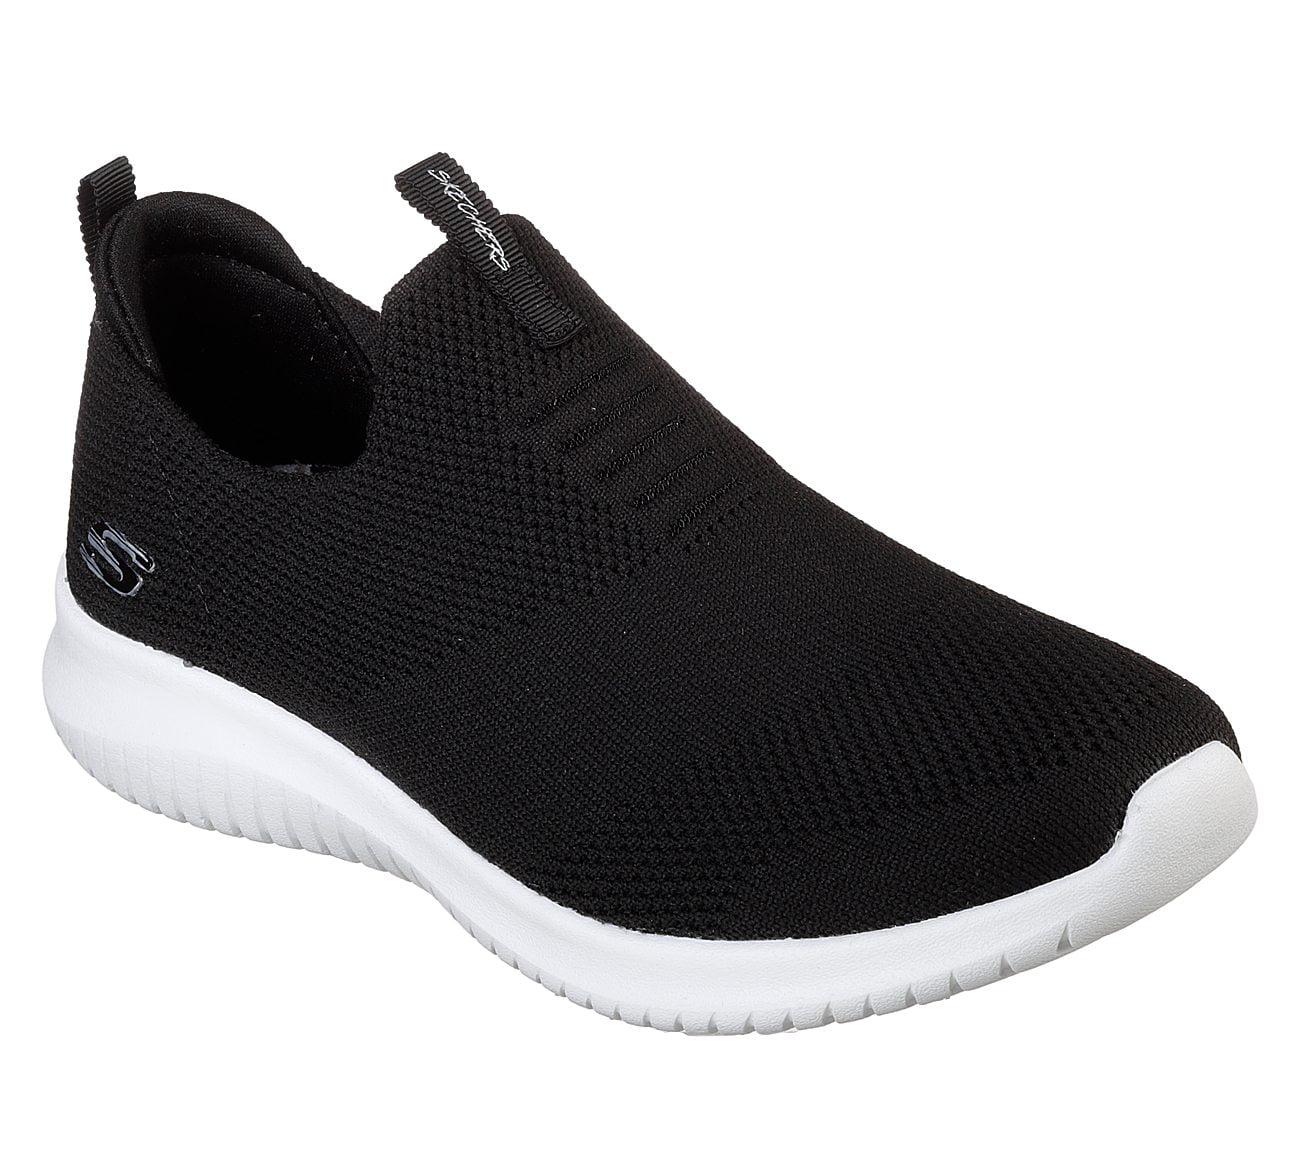 Ultra Flex - First Take Sneaker, Black